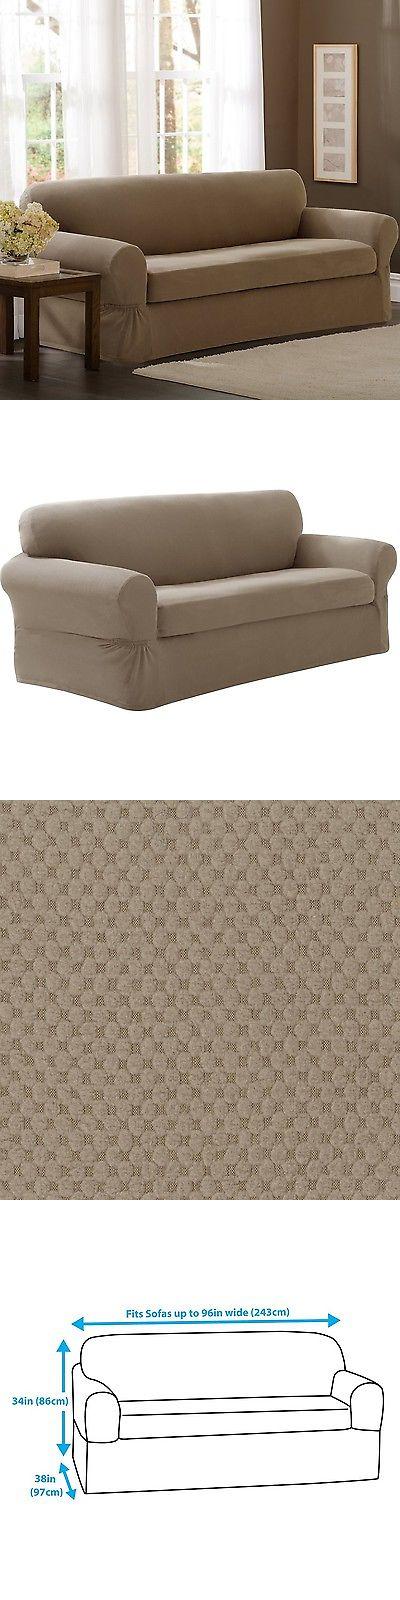 Slipcovers 175754 Maytex Pixel Stretch 2 Piece Sofa Slipcover